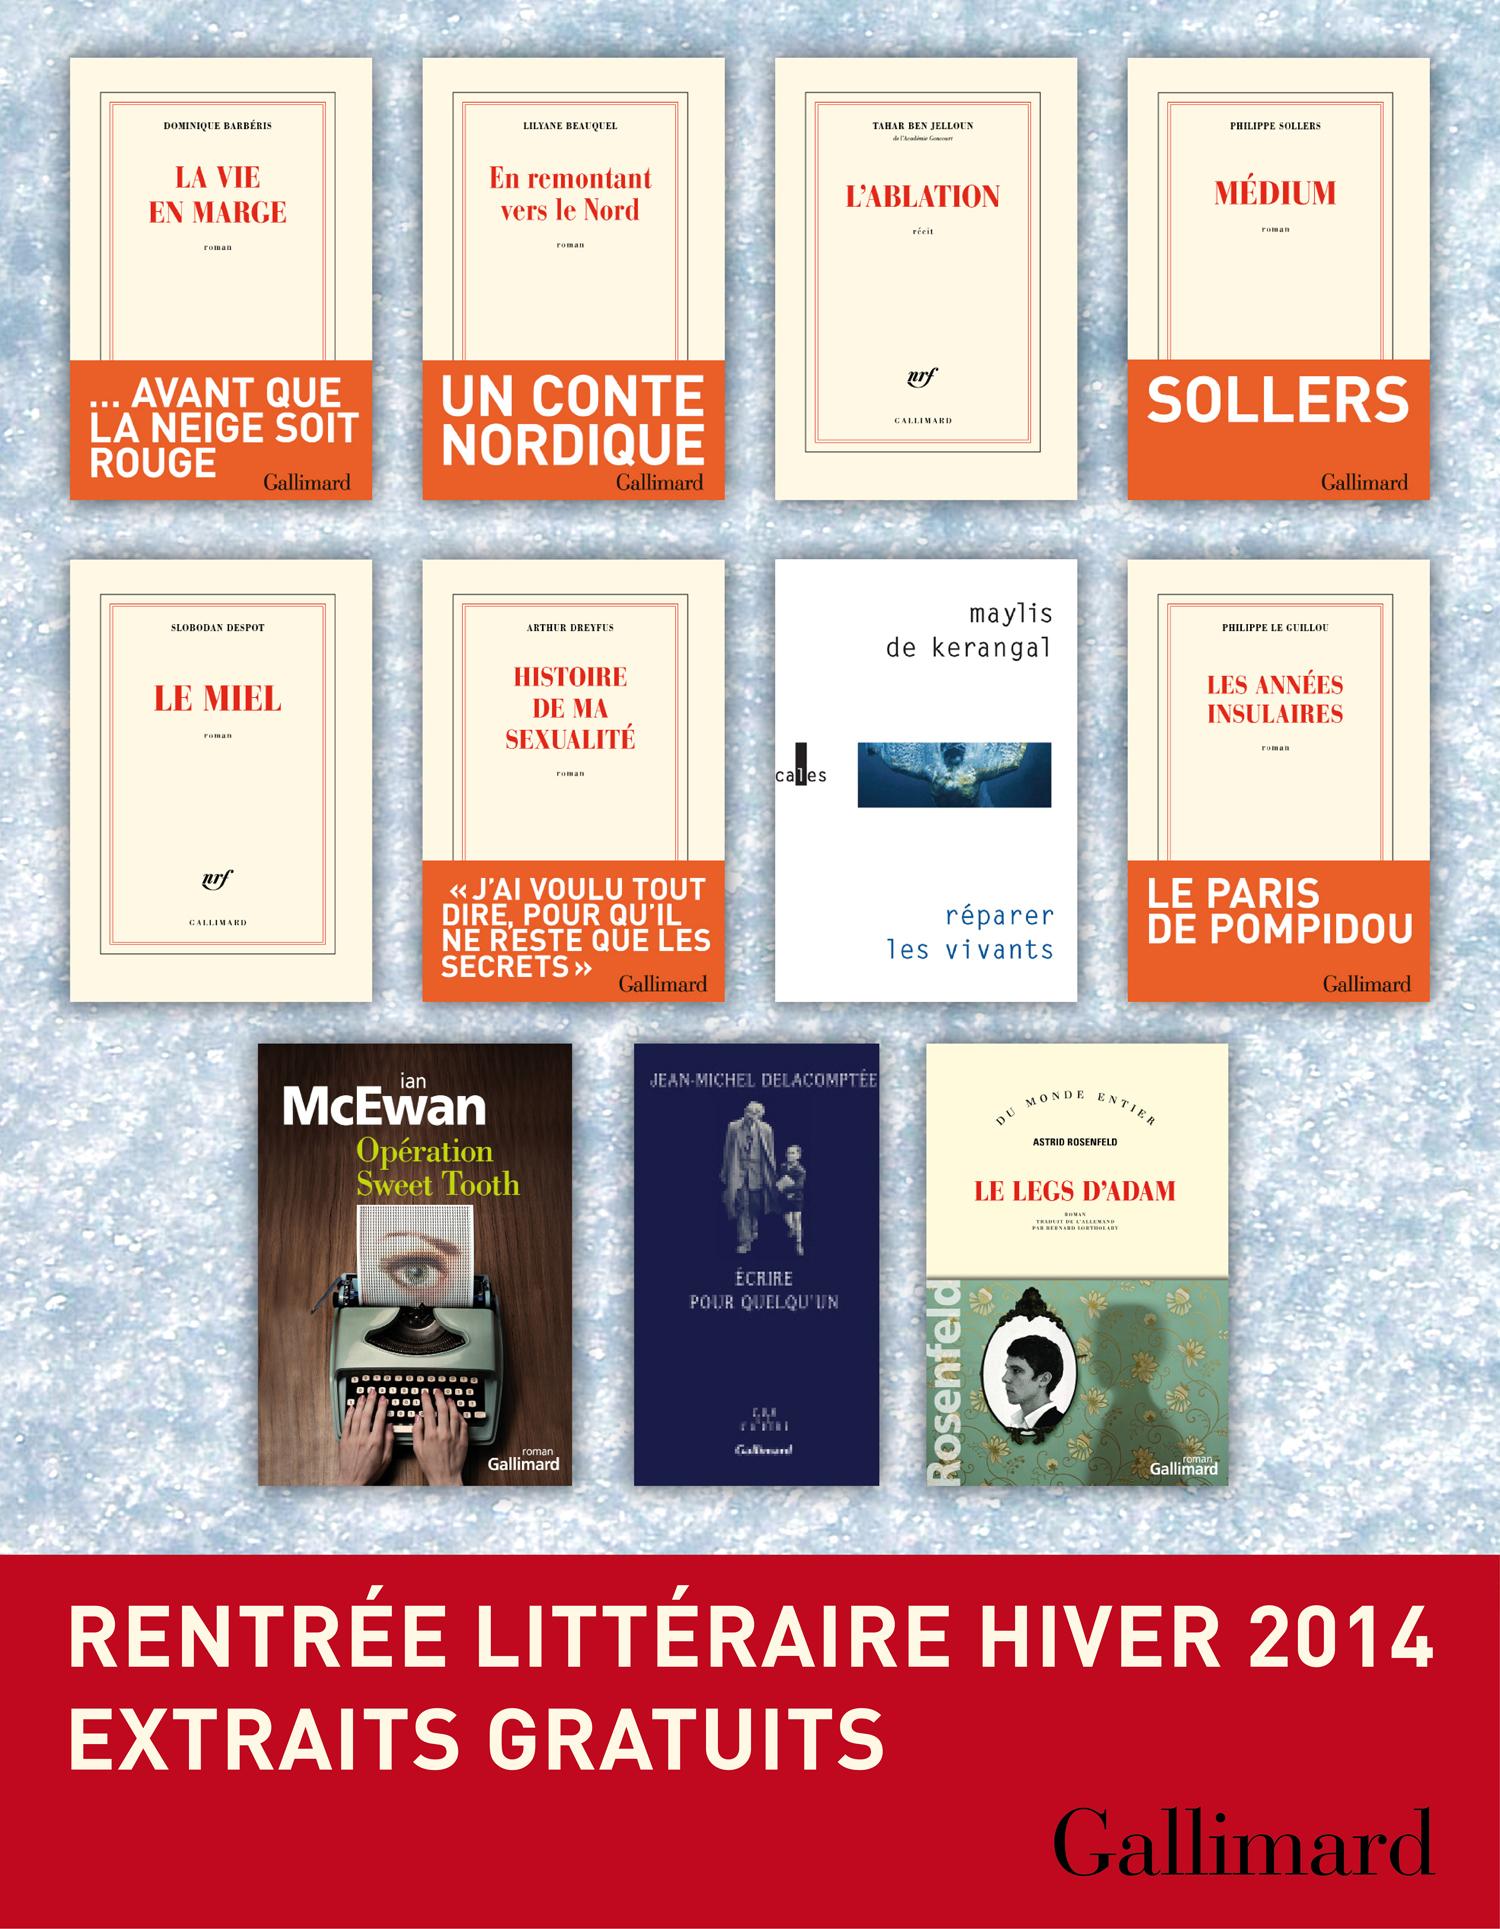 EXTRAITS GRATUITS - RENTREE LITTERAIRE GALLIMARD HIVER 2014